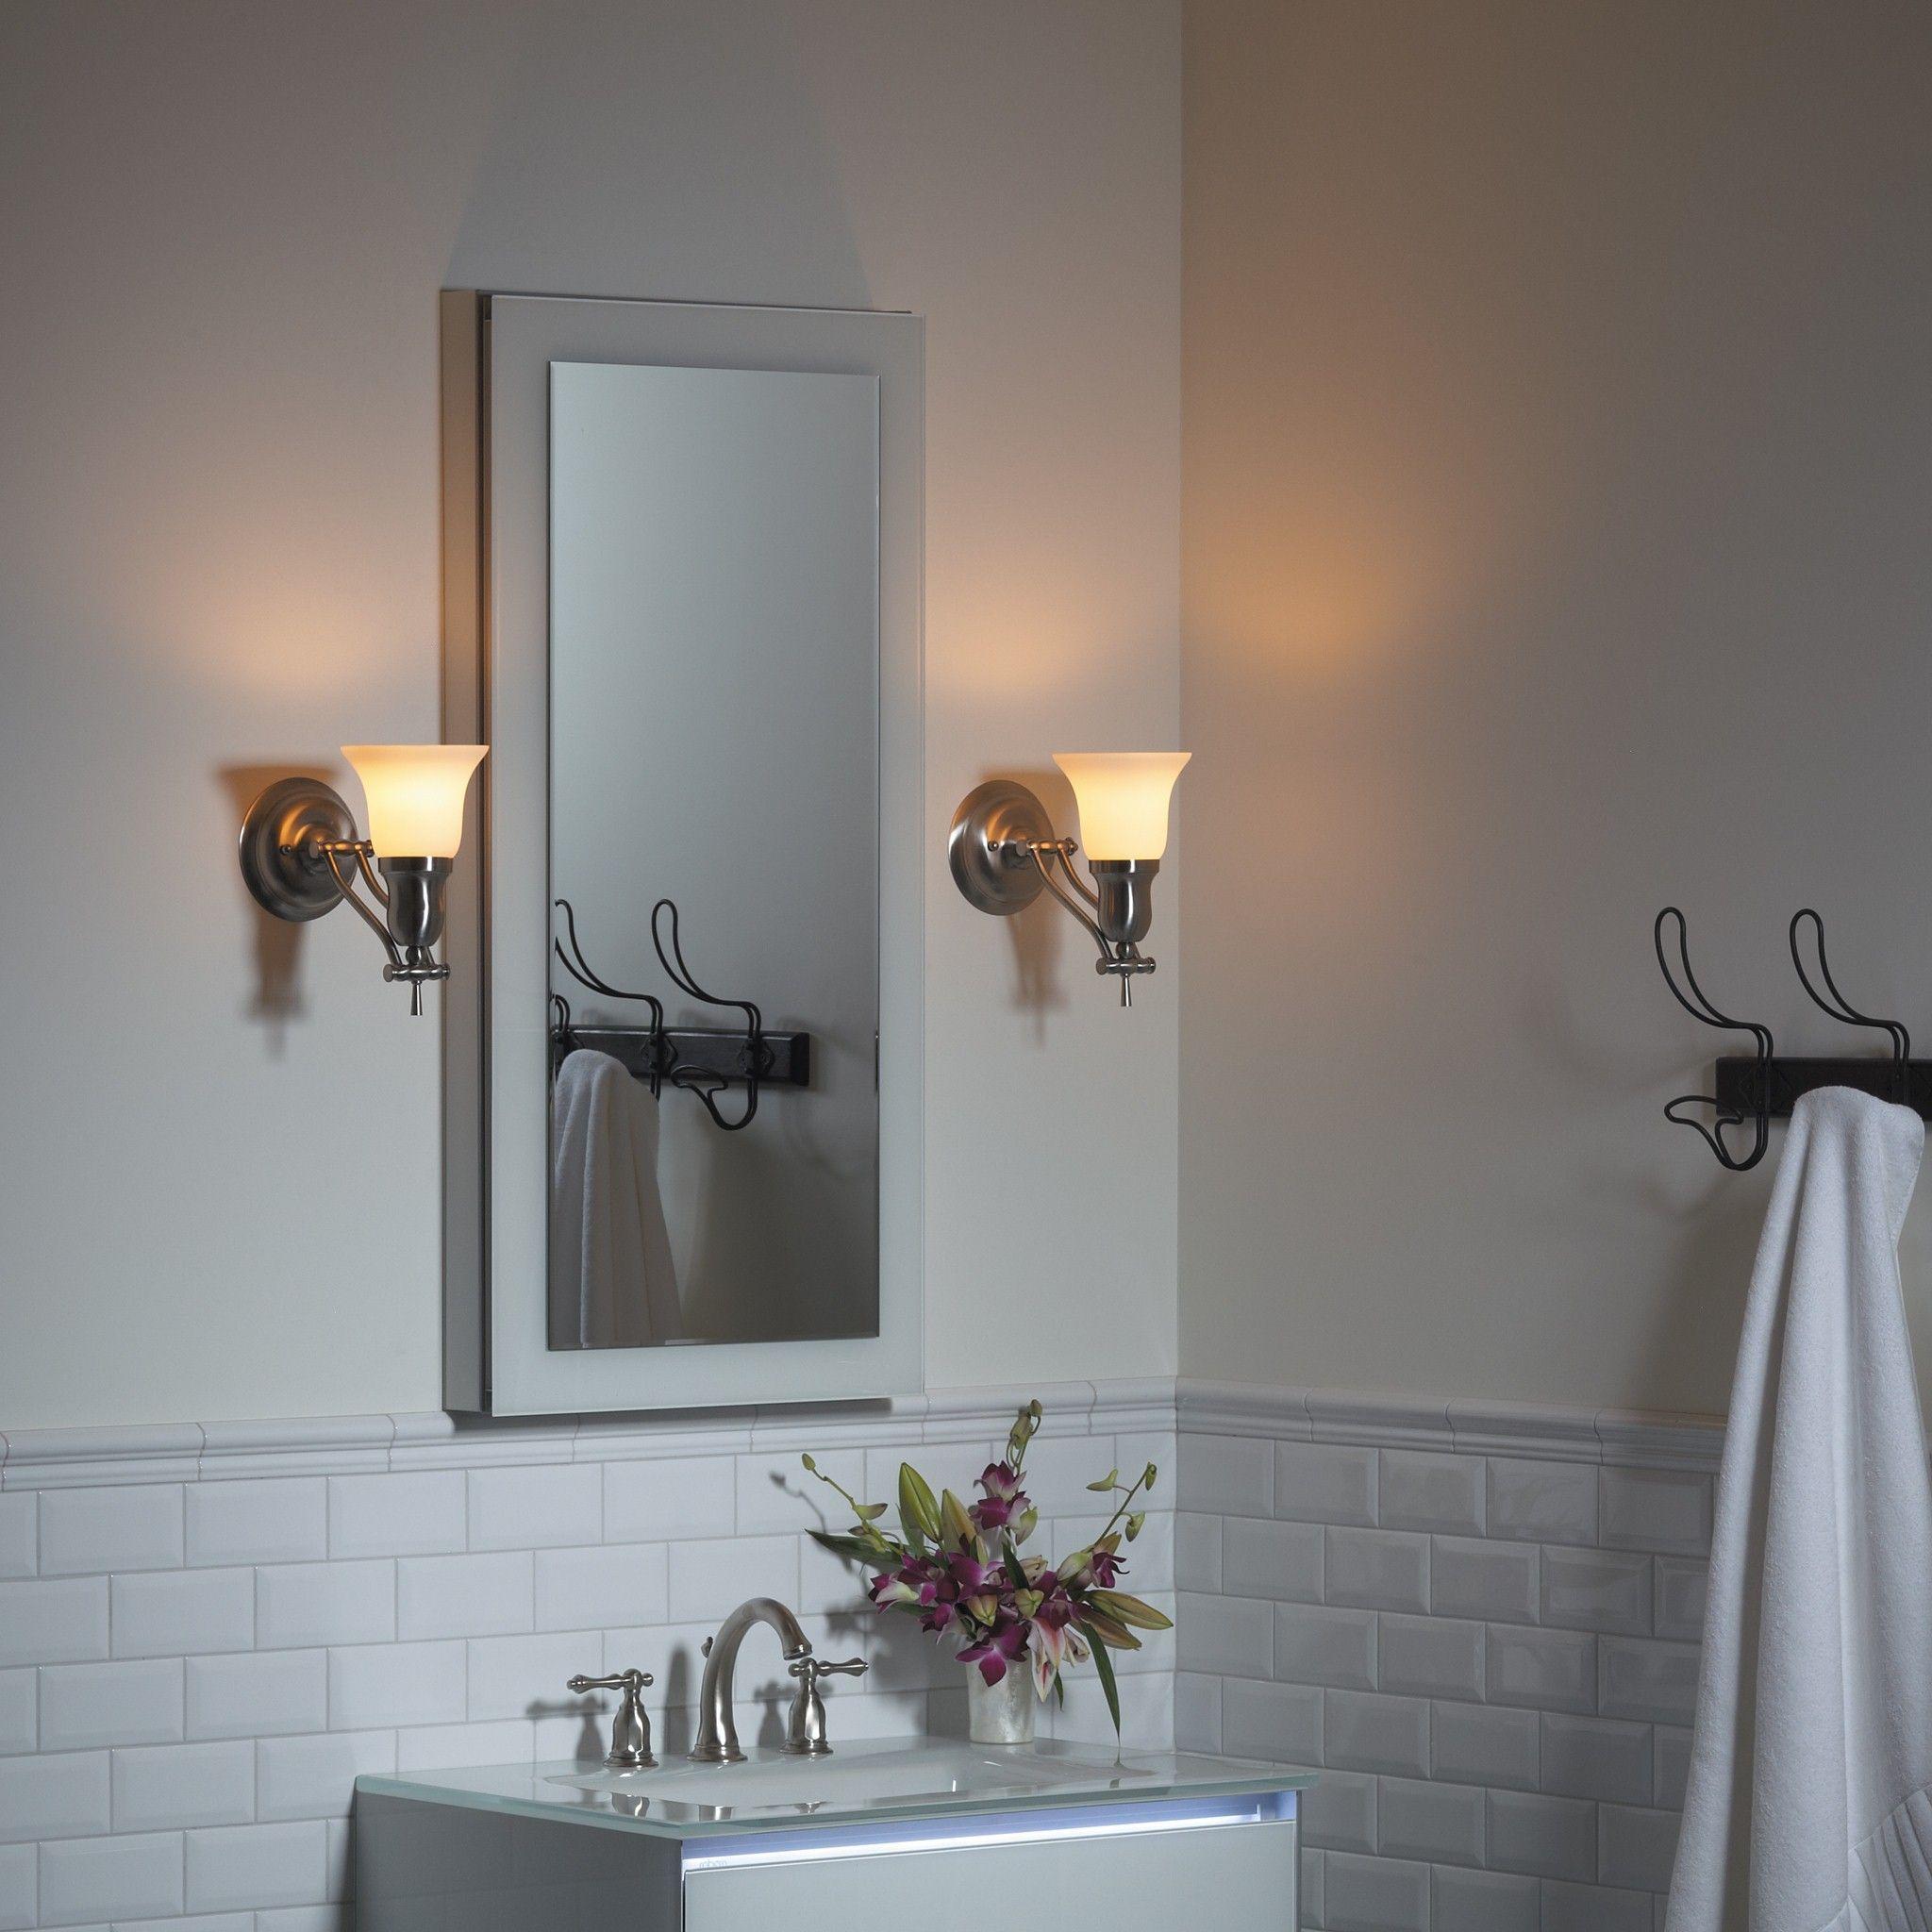 Latest Posts Under: Bathroom sconces